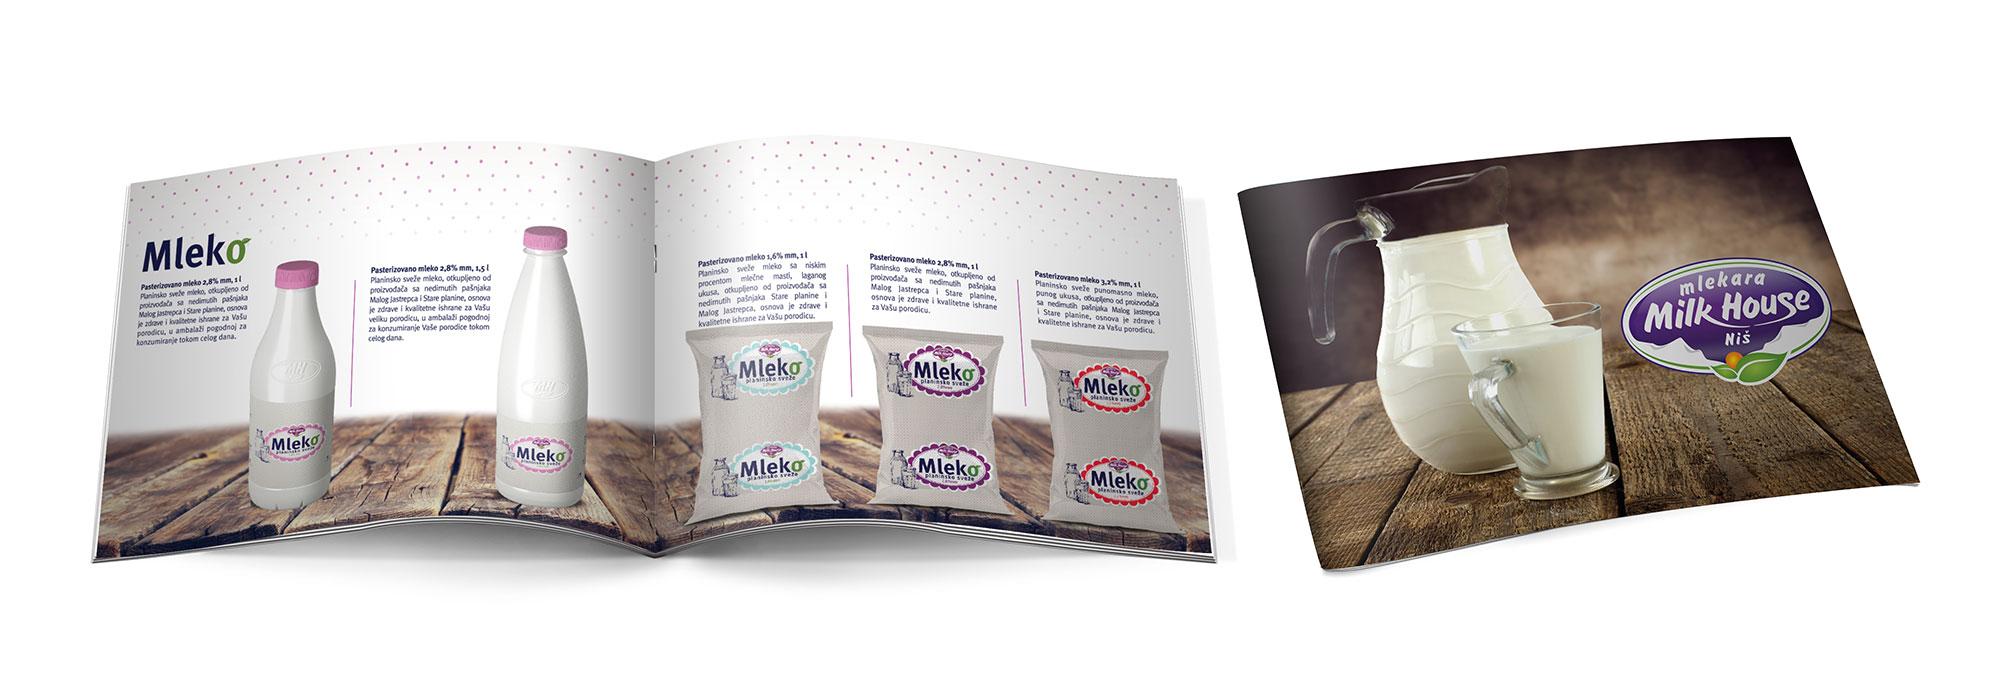 milk house proizvodi